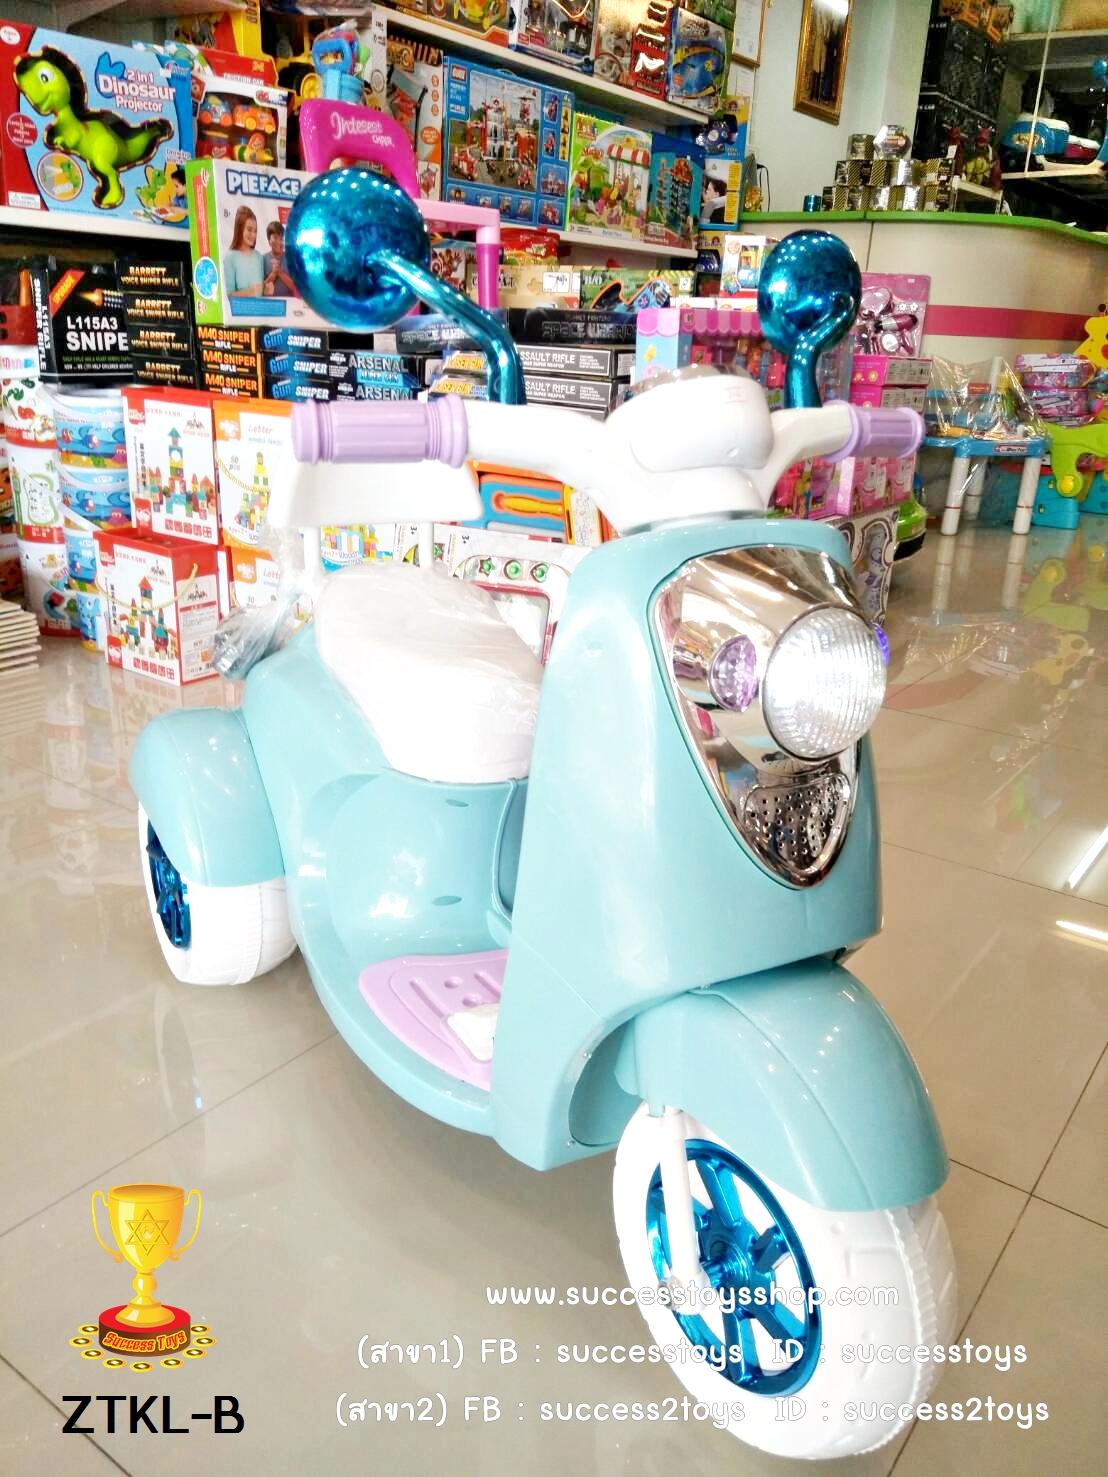 ZTKL-B รถมอเตอร์ไซค์เด็กนั่งไฟฟ้าฟีโน่สีฟ้า